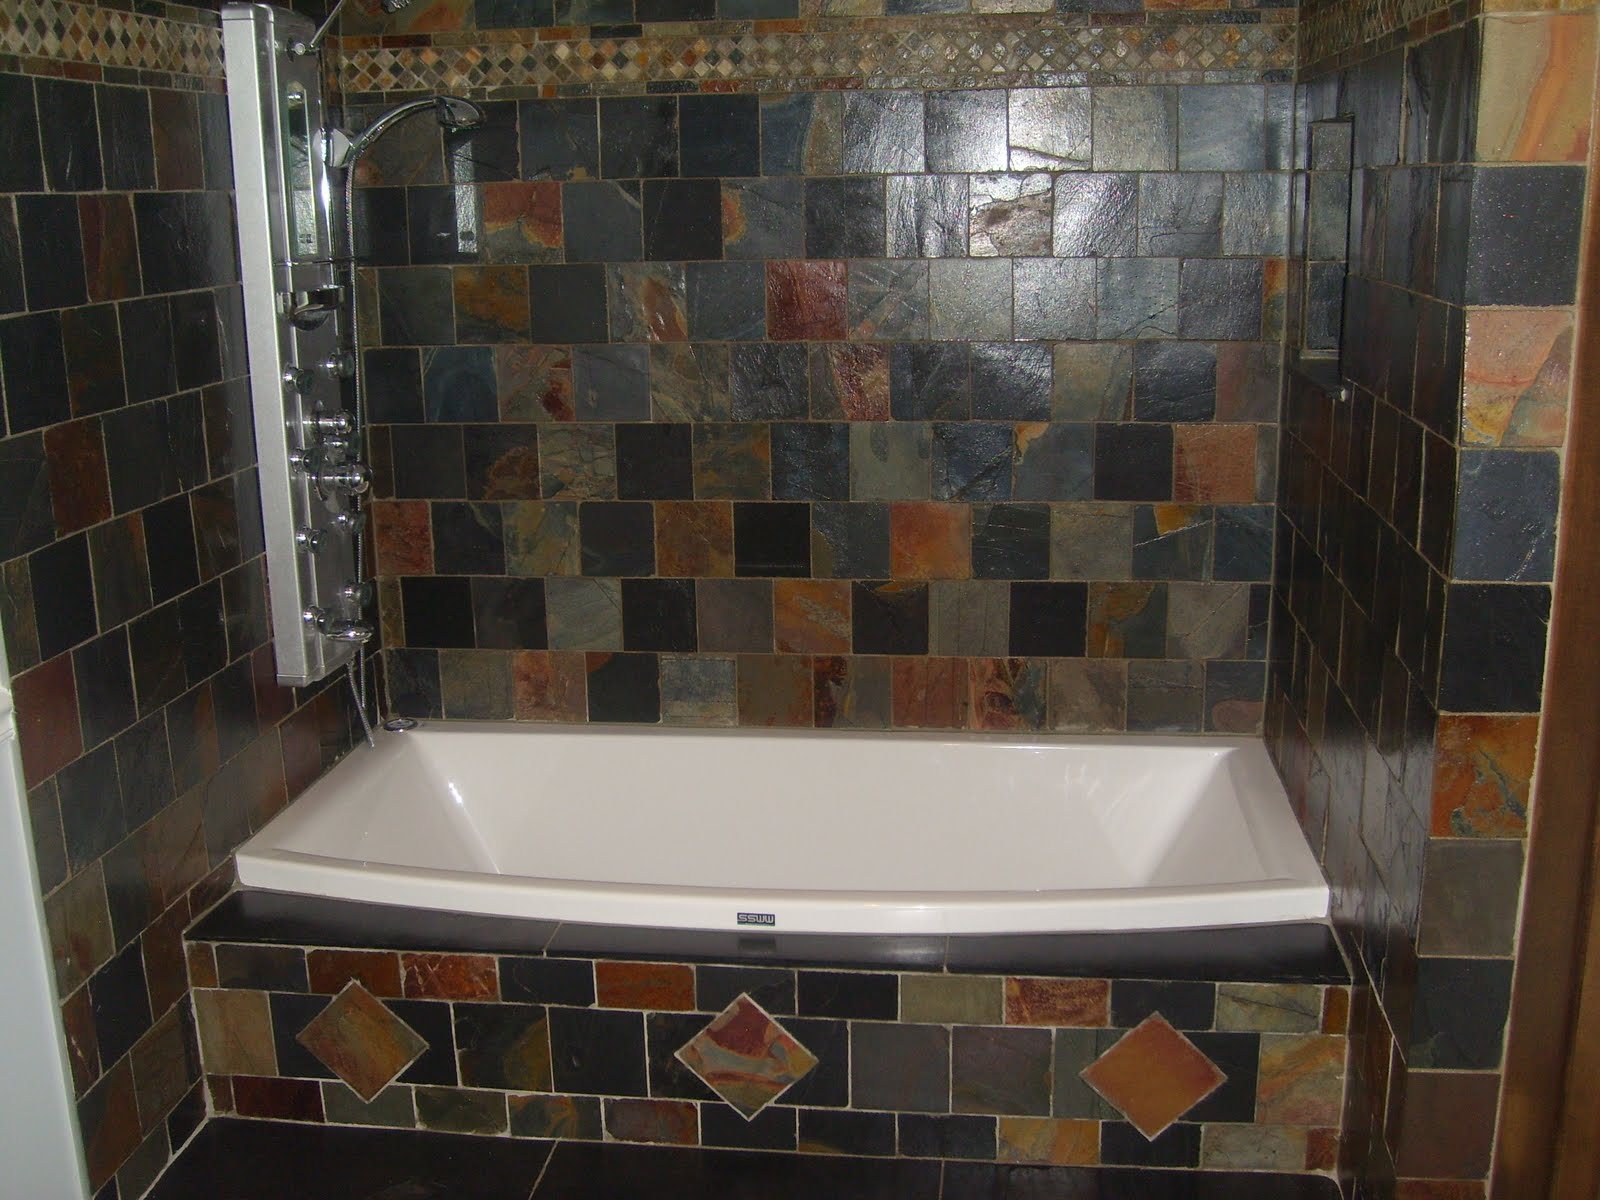 Slate Tile For Bathroom  Slate Tile Bathroom Tiles Floor. Slate Tile For Bathroom  Slate Tile Bathroom Glacier Fuda on Amortech